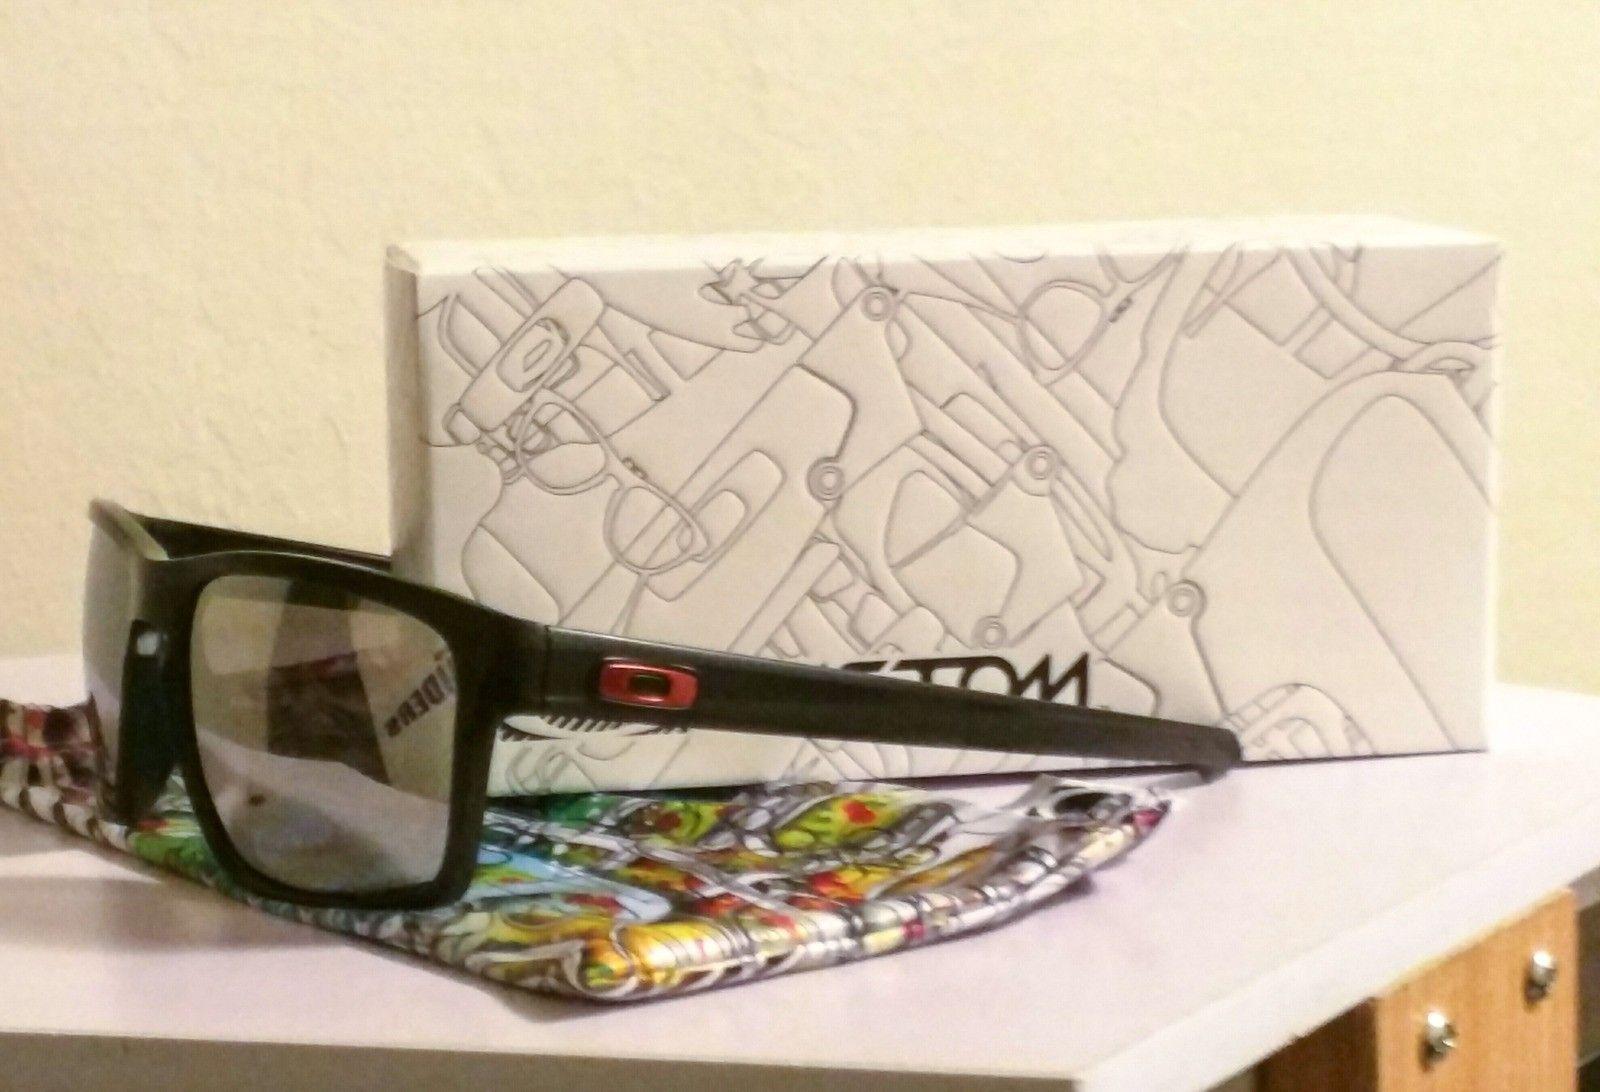 Delivery time for First Custom Sunglasses from Oakley? - uploadfromtaptalk1450235789403.jpg